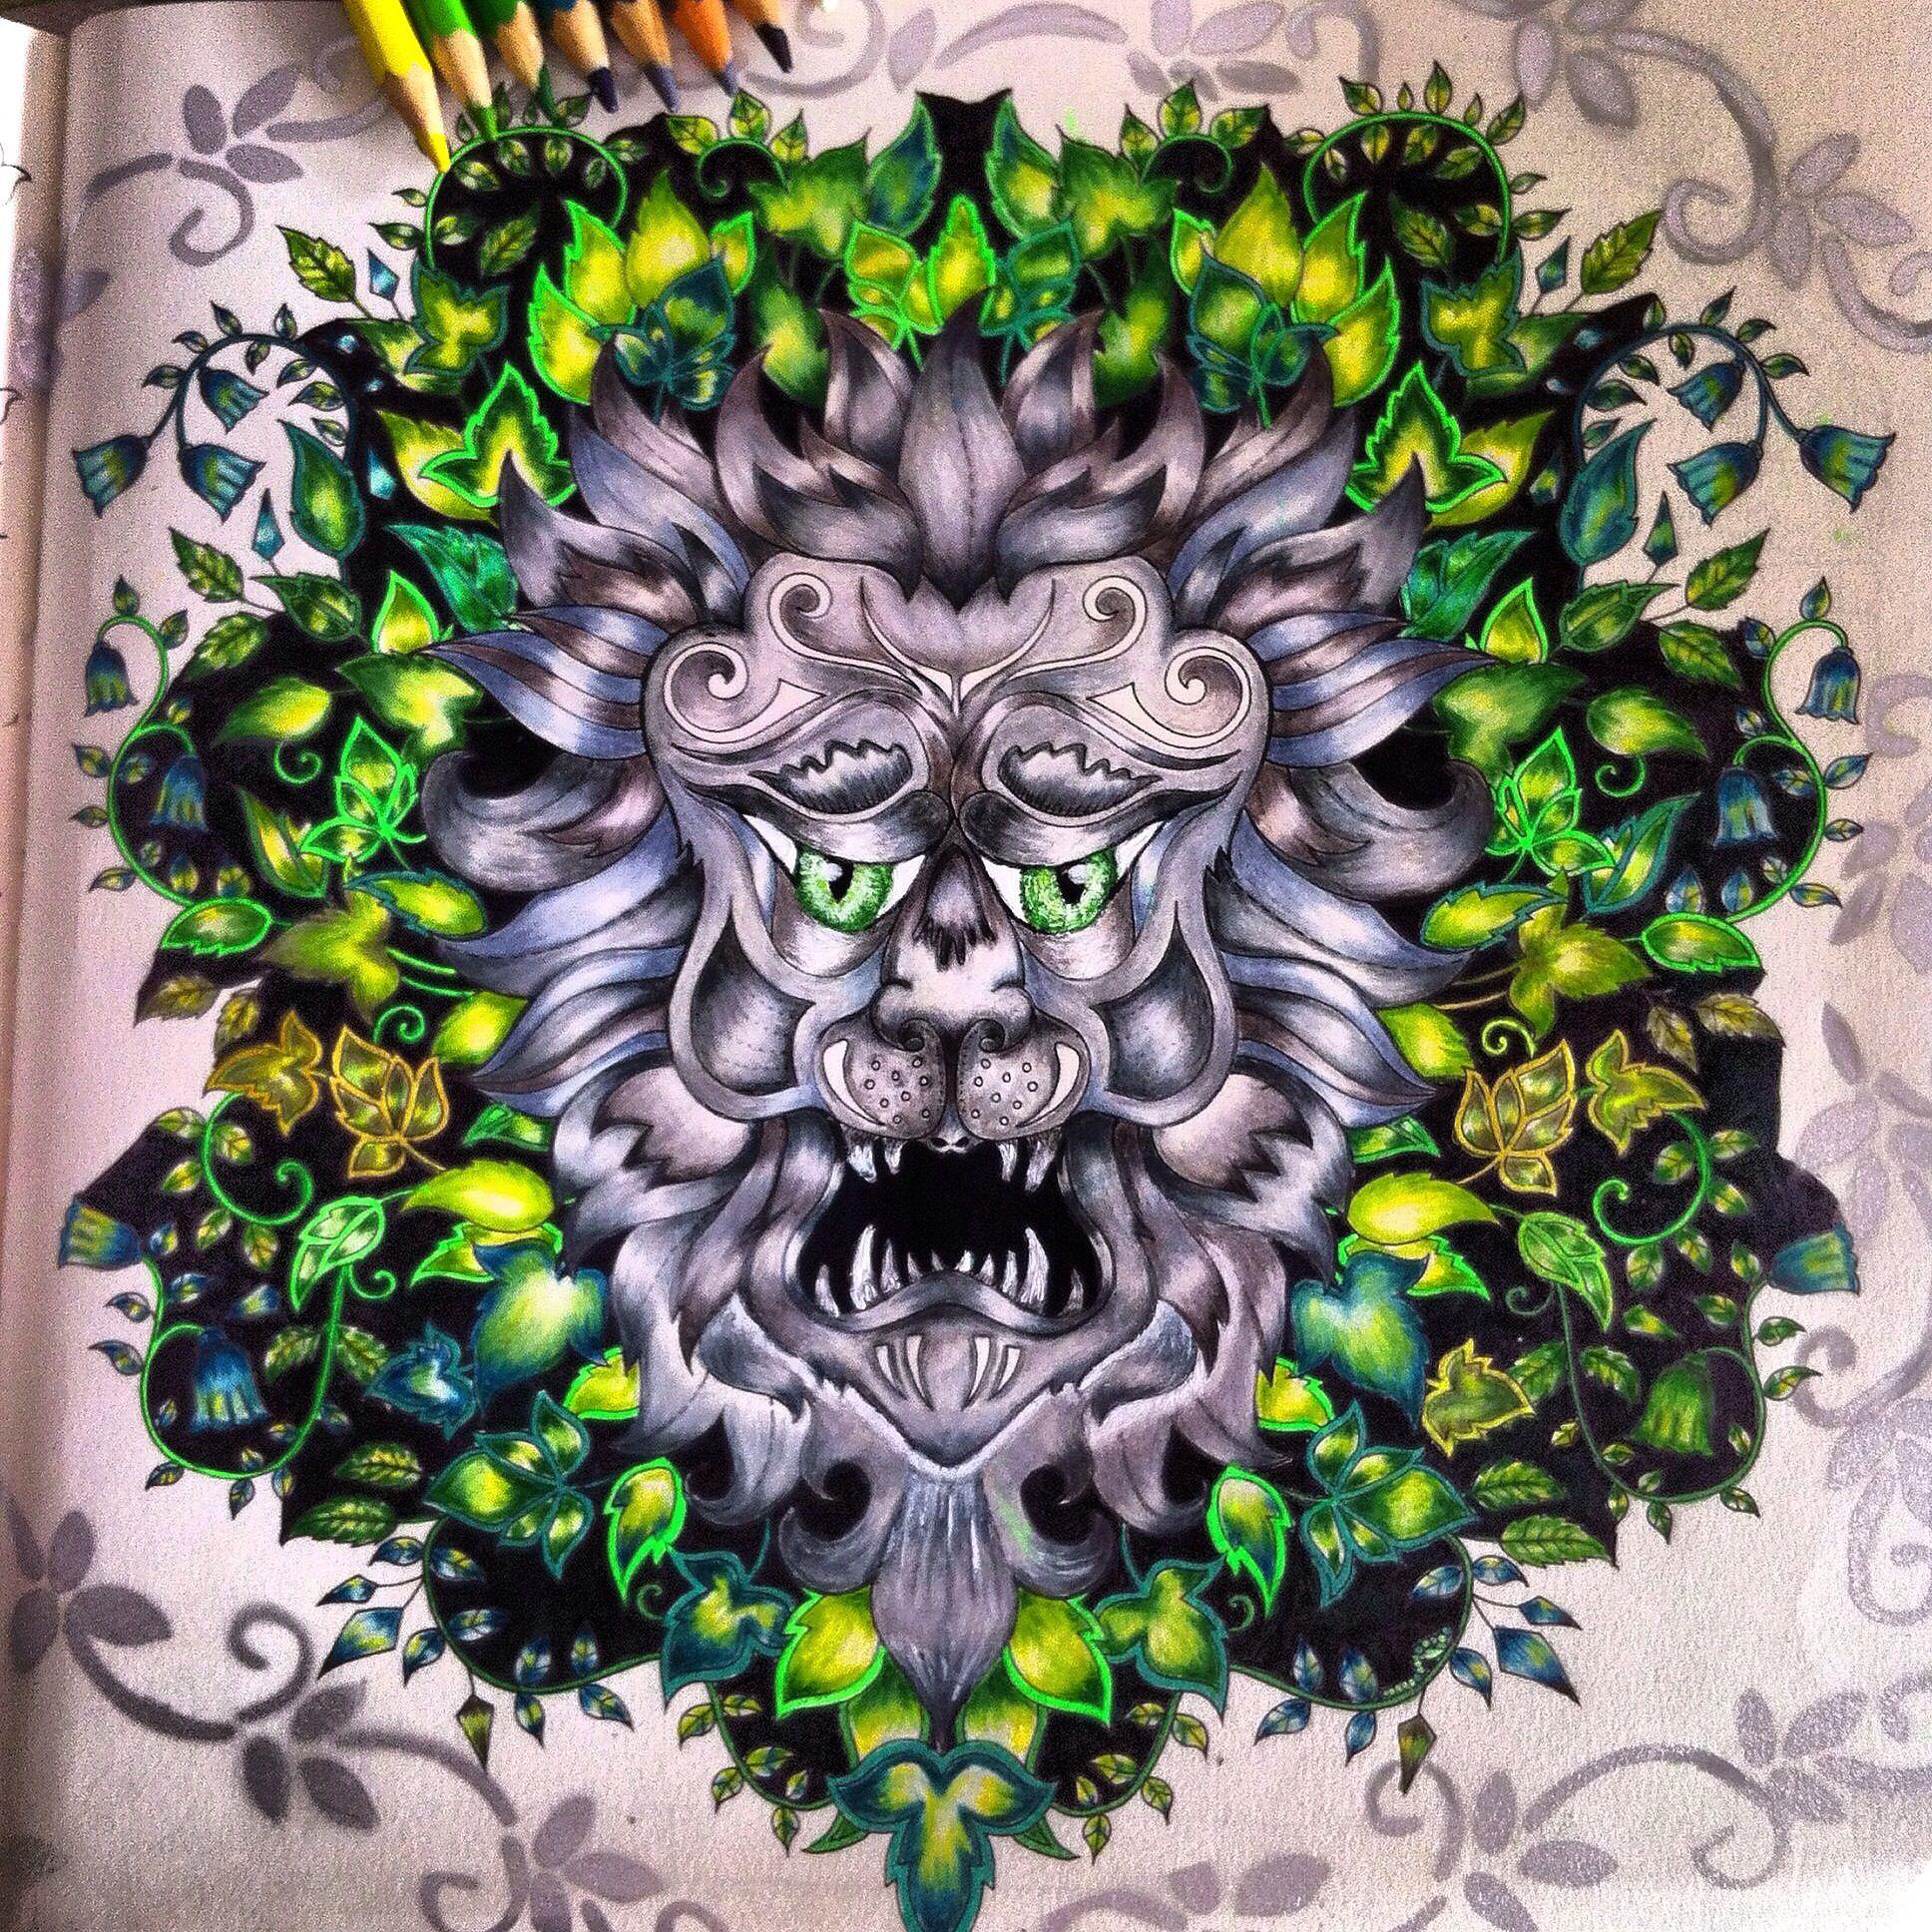 LEÃO FLORESTA ENCANTADA Enchanted forest coloring book